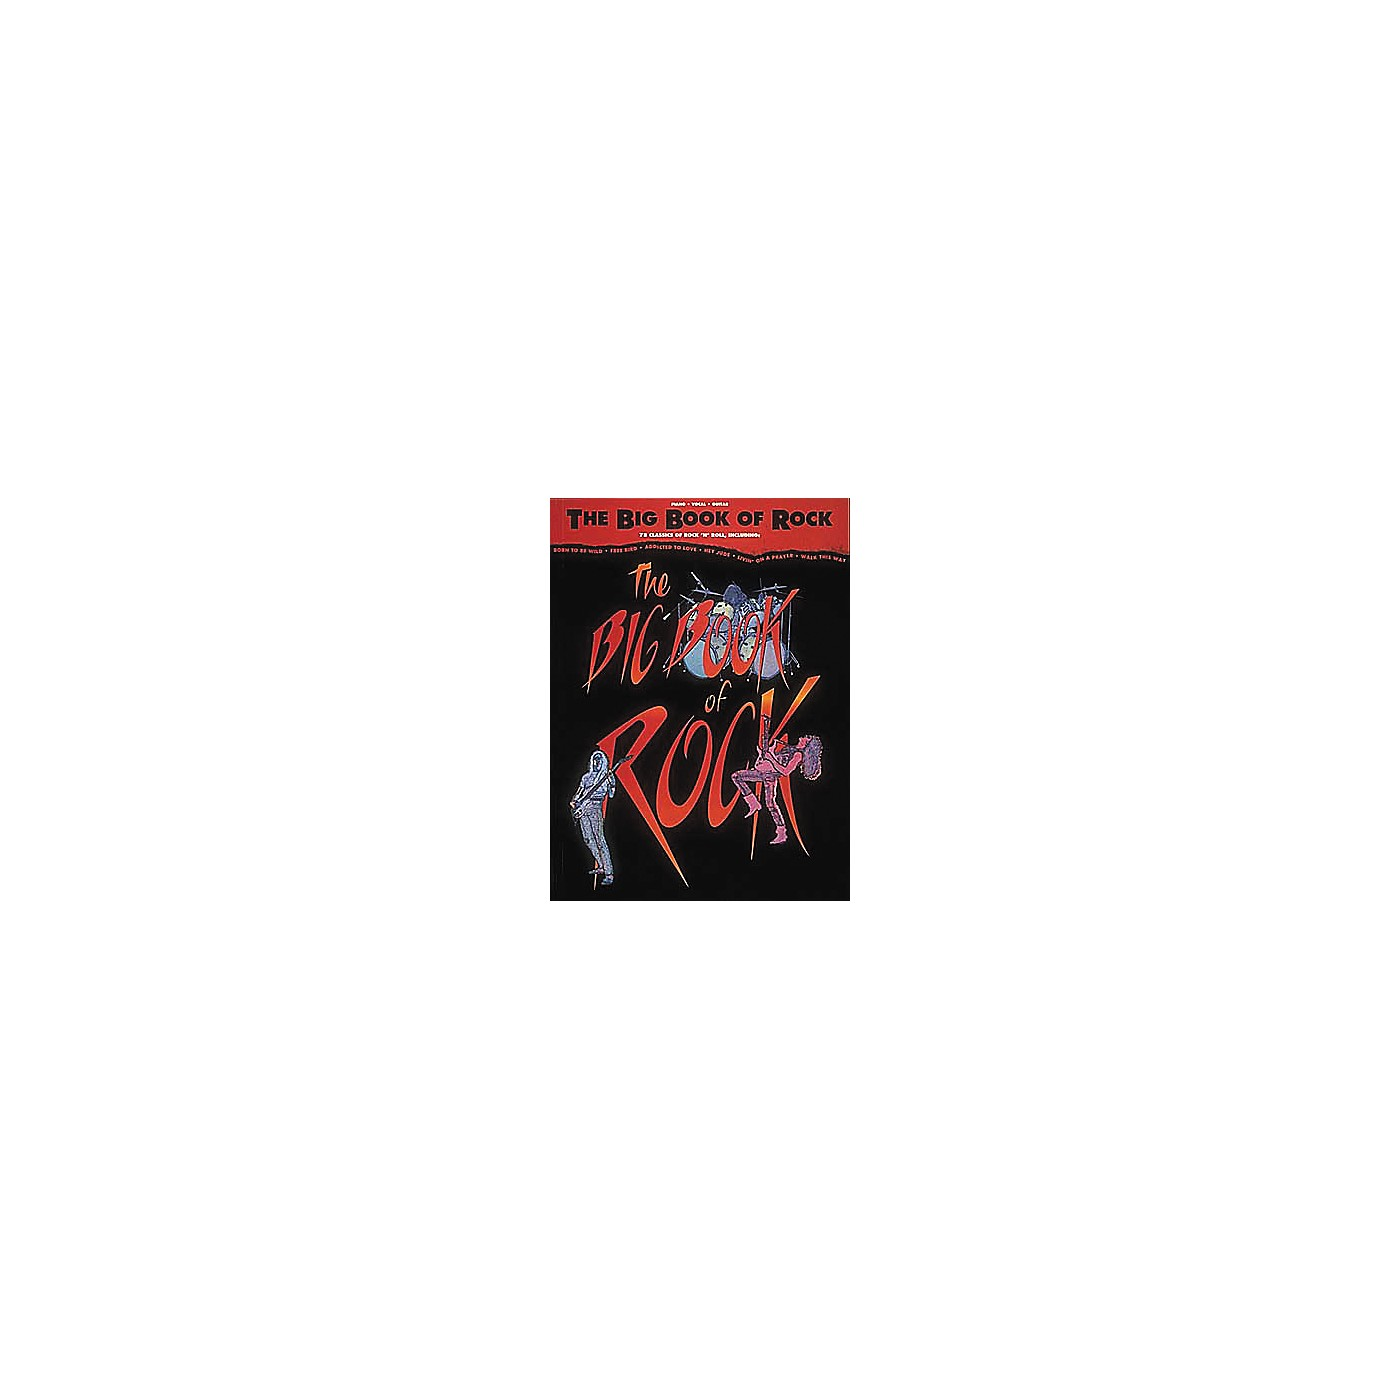 Hal Leonard The Big Book of Rock Piano, Vocal, Guitar Songbook thumbnail